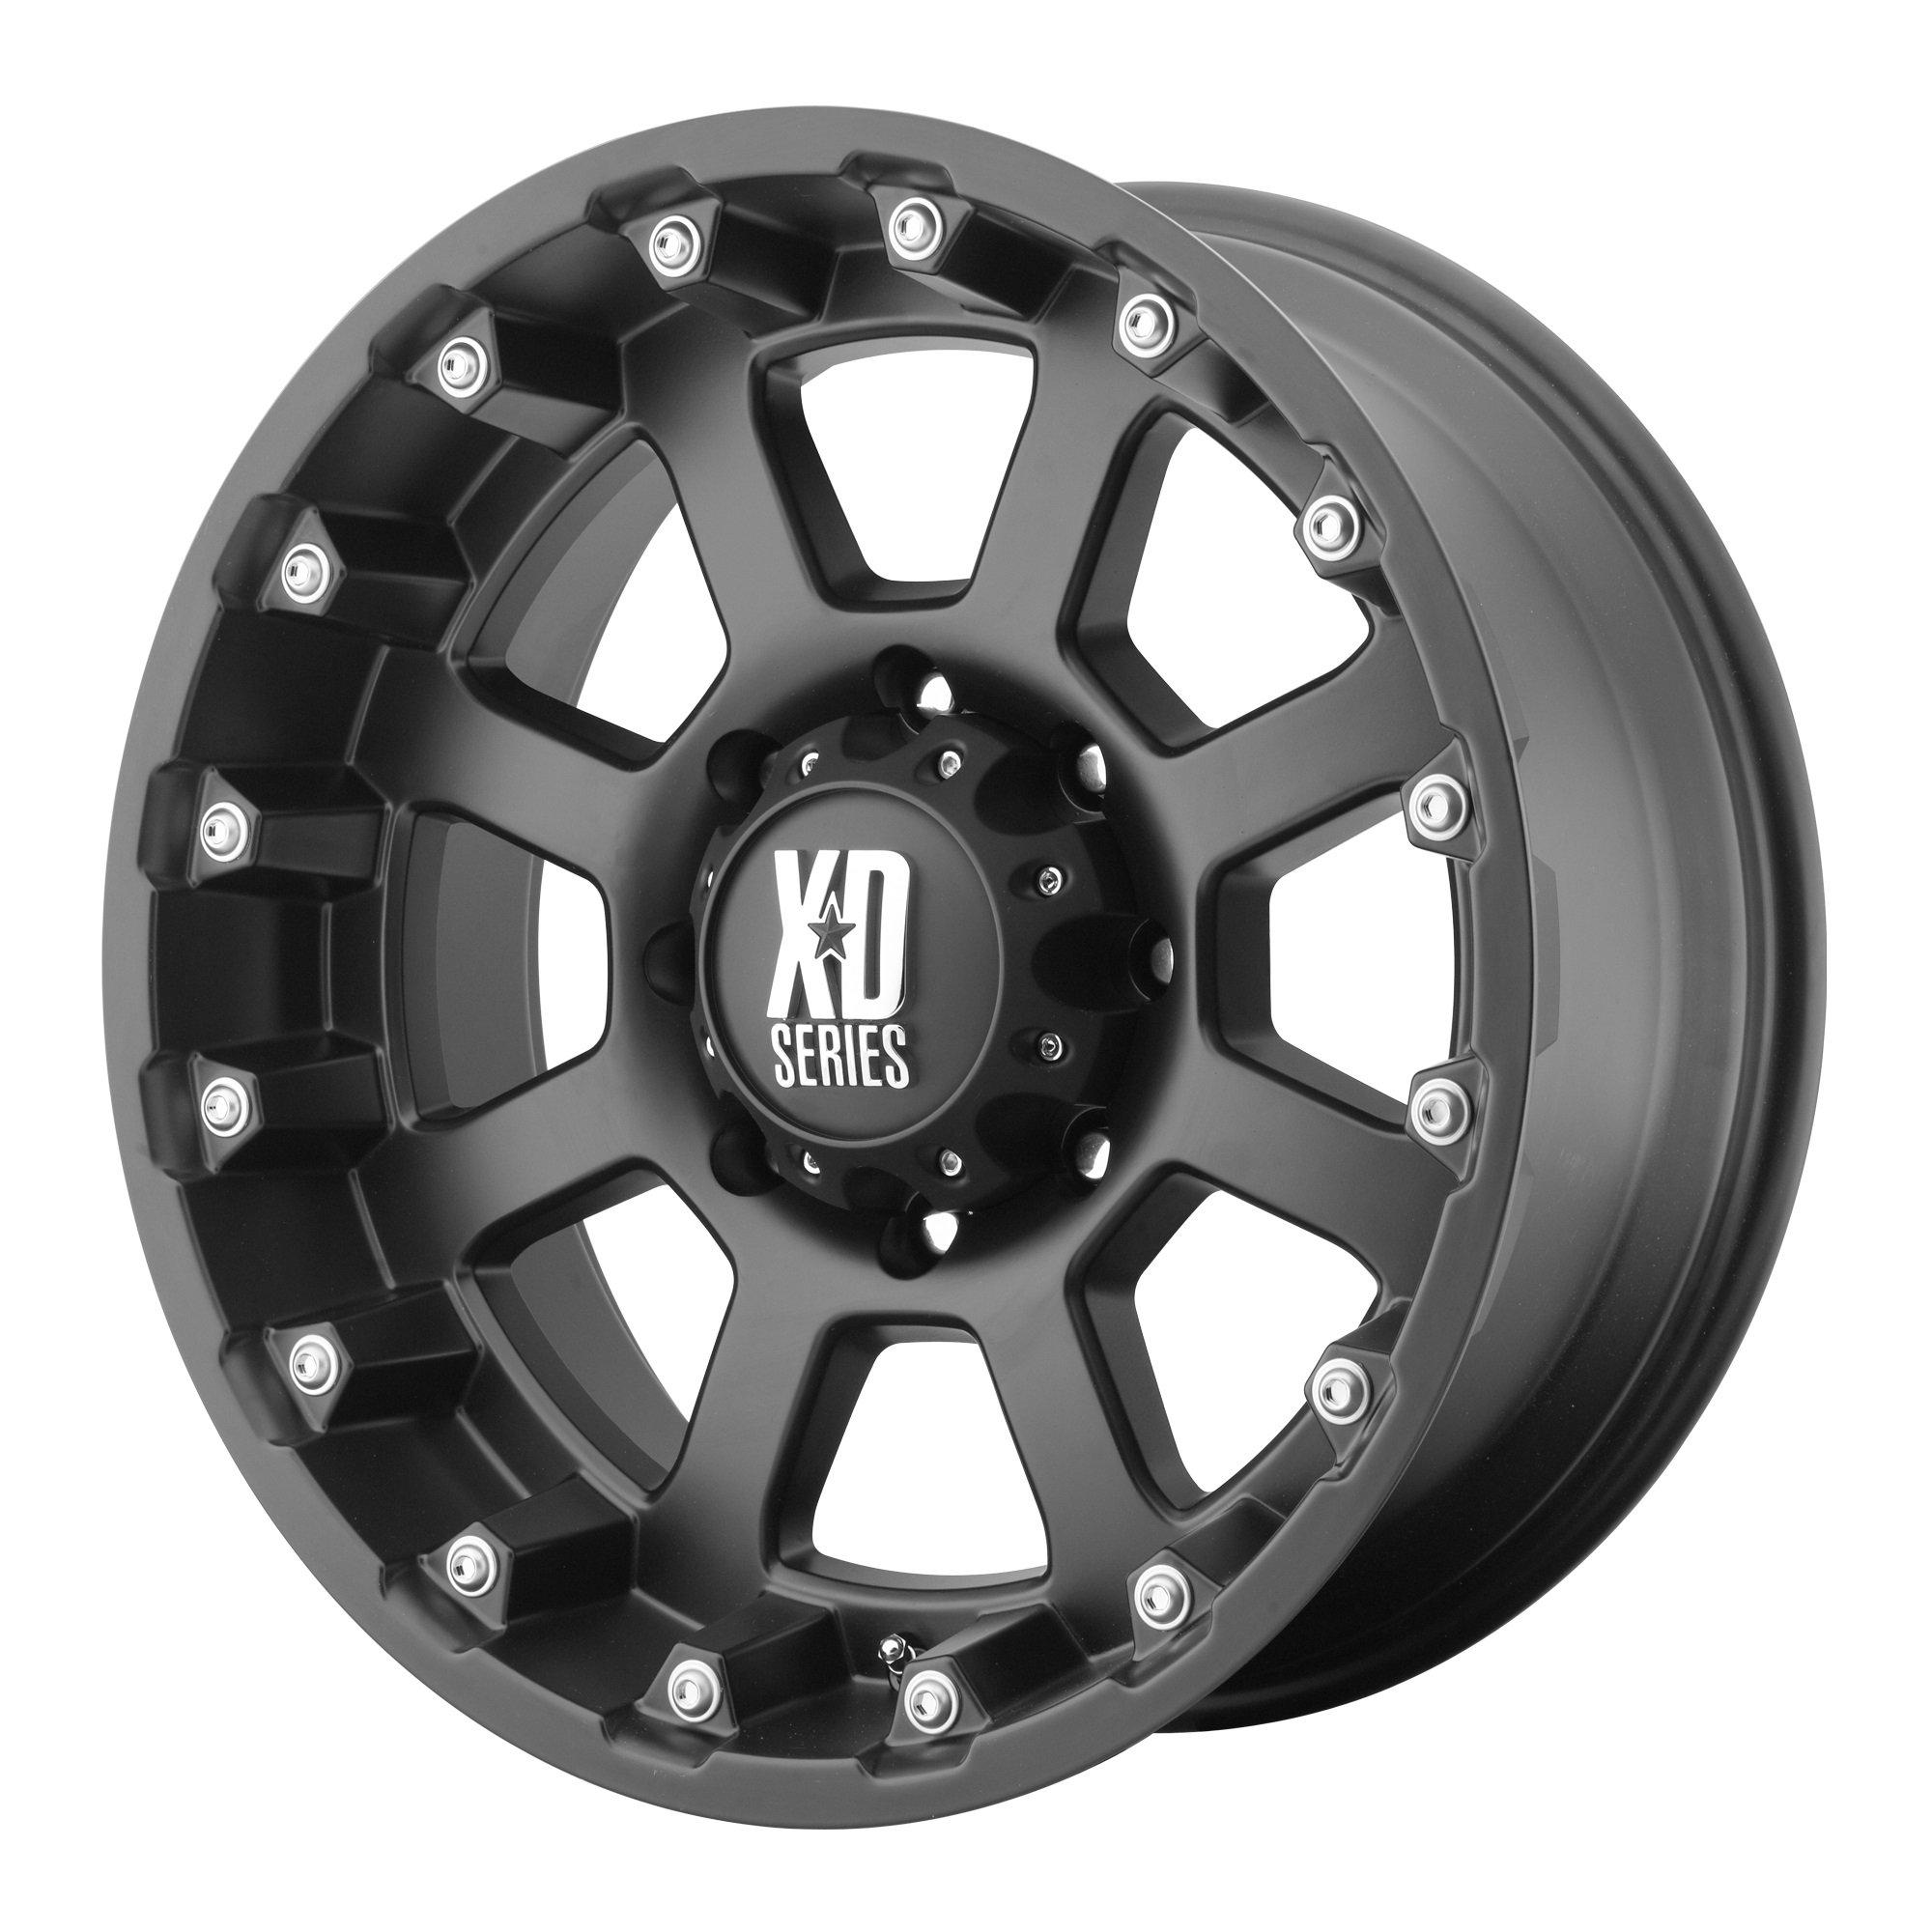 XD Series by KMC Wheels XD807 Strike Matte Black Wheel (20x10''/6x139.7mm, -24mm offset) by XD Series by KMC Wheels (Image #1)